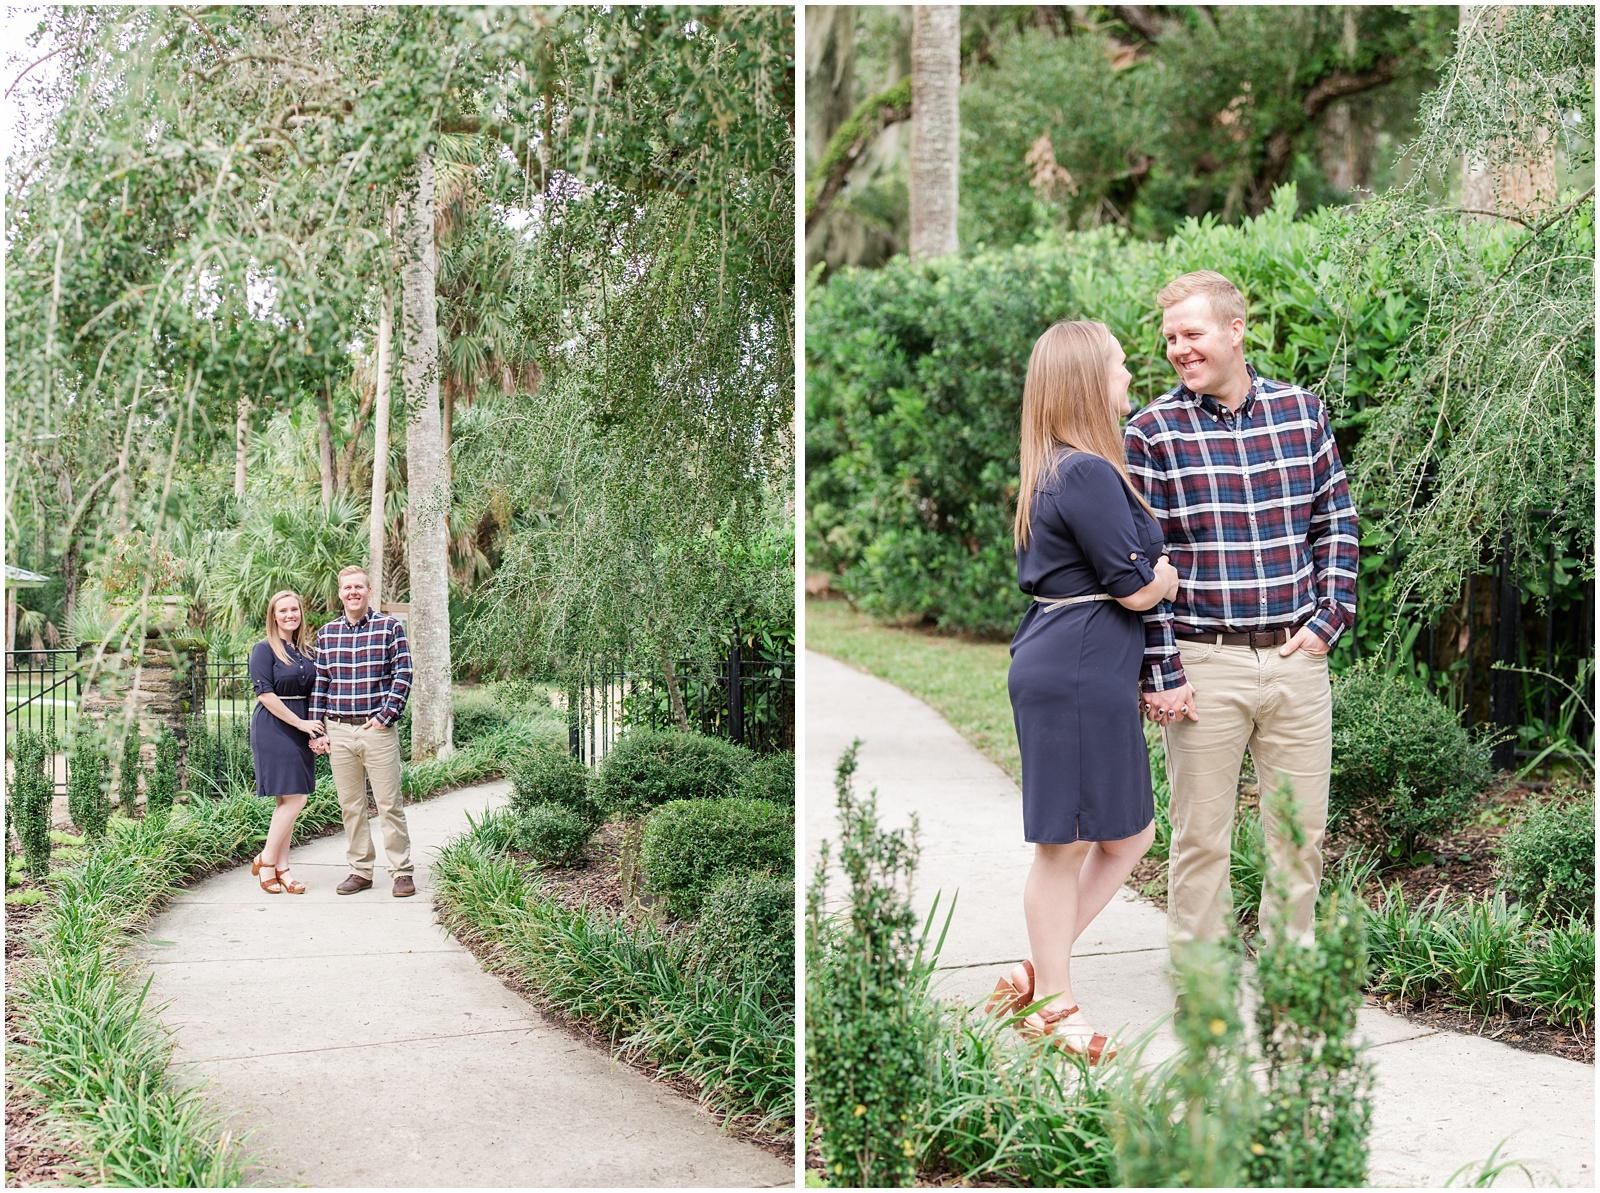 Palm Coast_Washington Oaks Garden_State Park_Engagement_Portraits_12.jpg